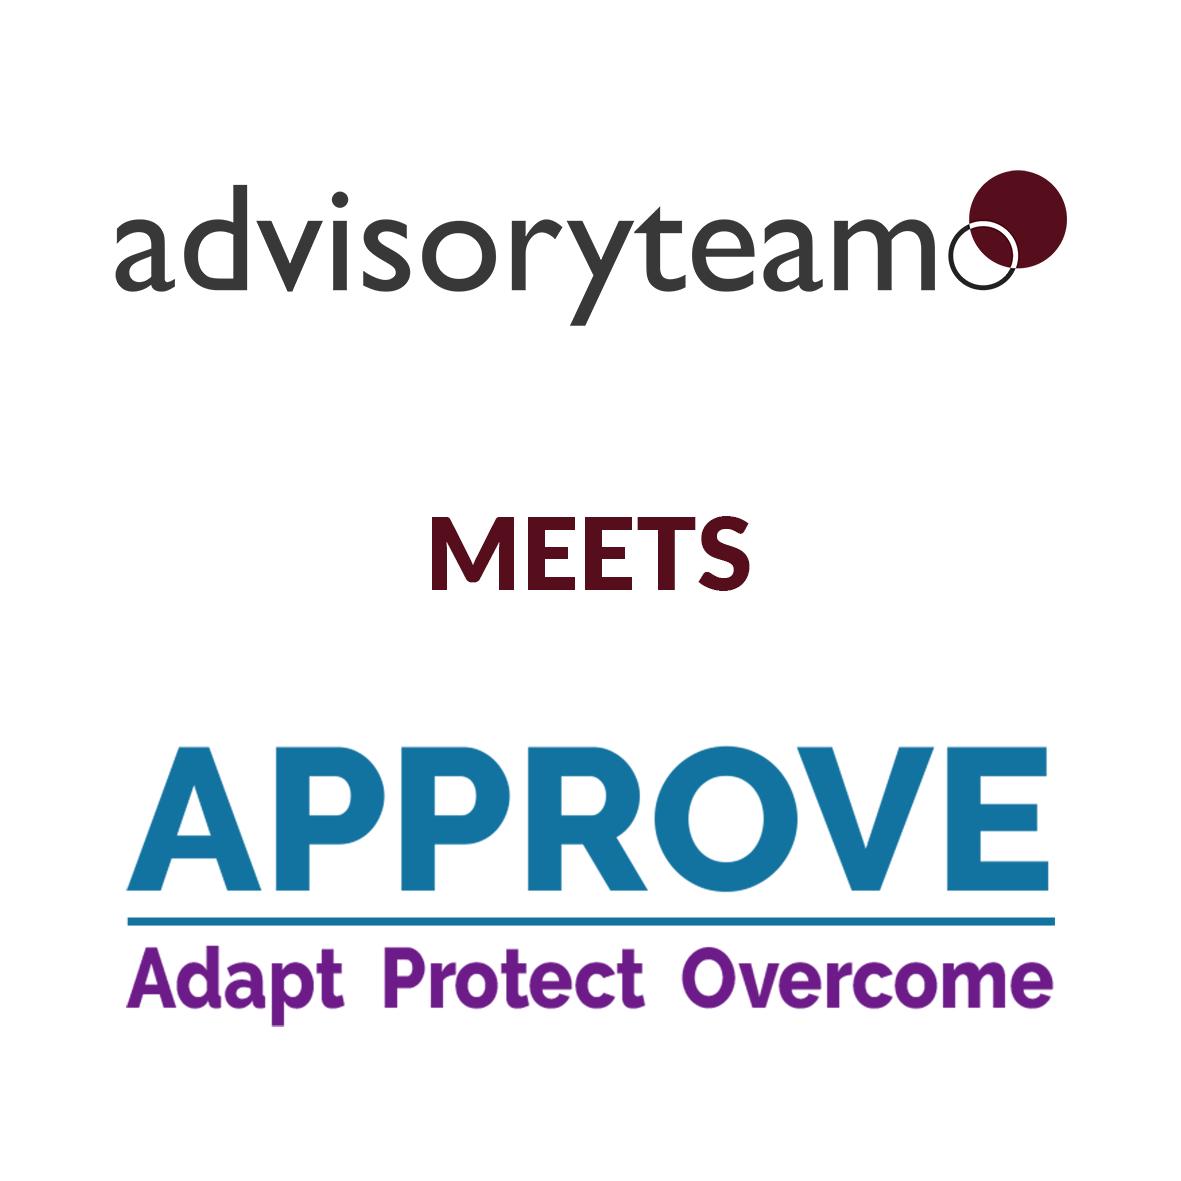 advisoryteam in der Arbeitsgruppe APPROVE